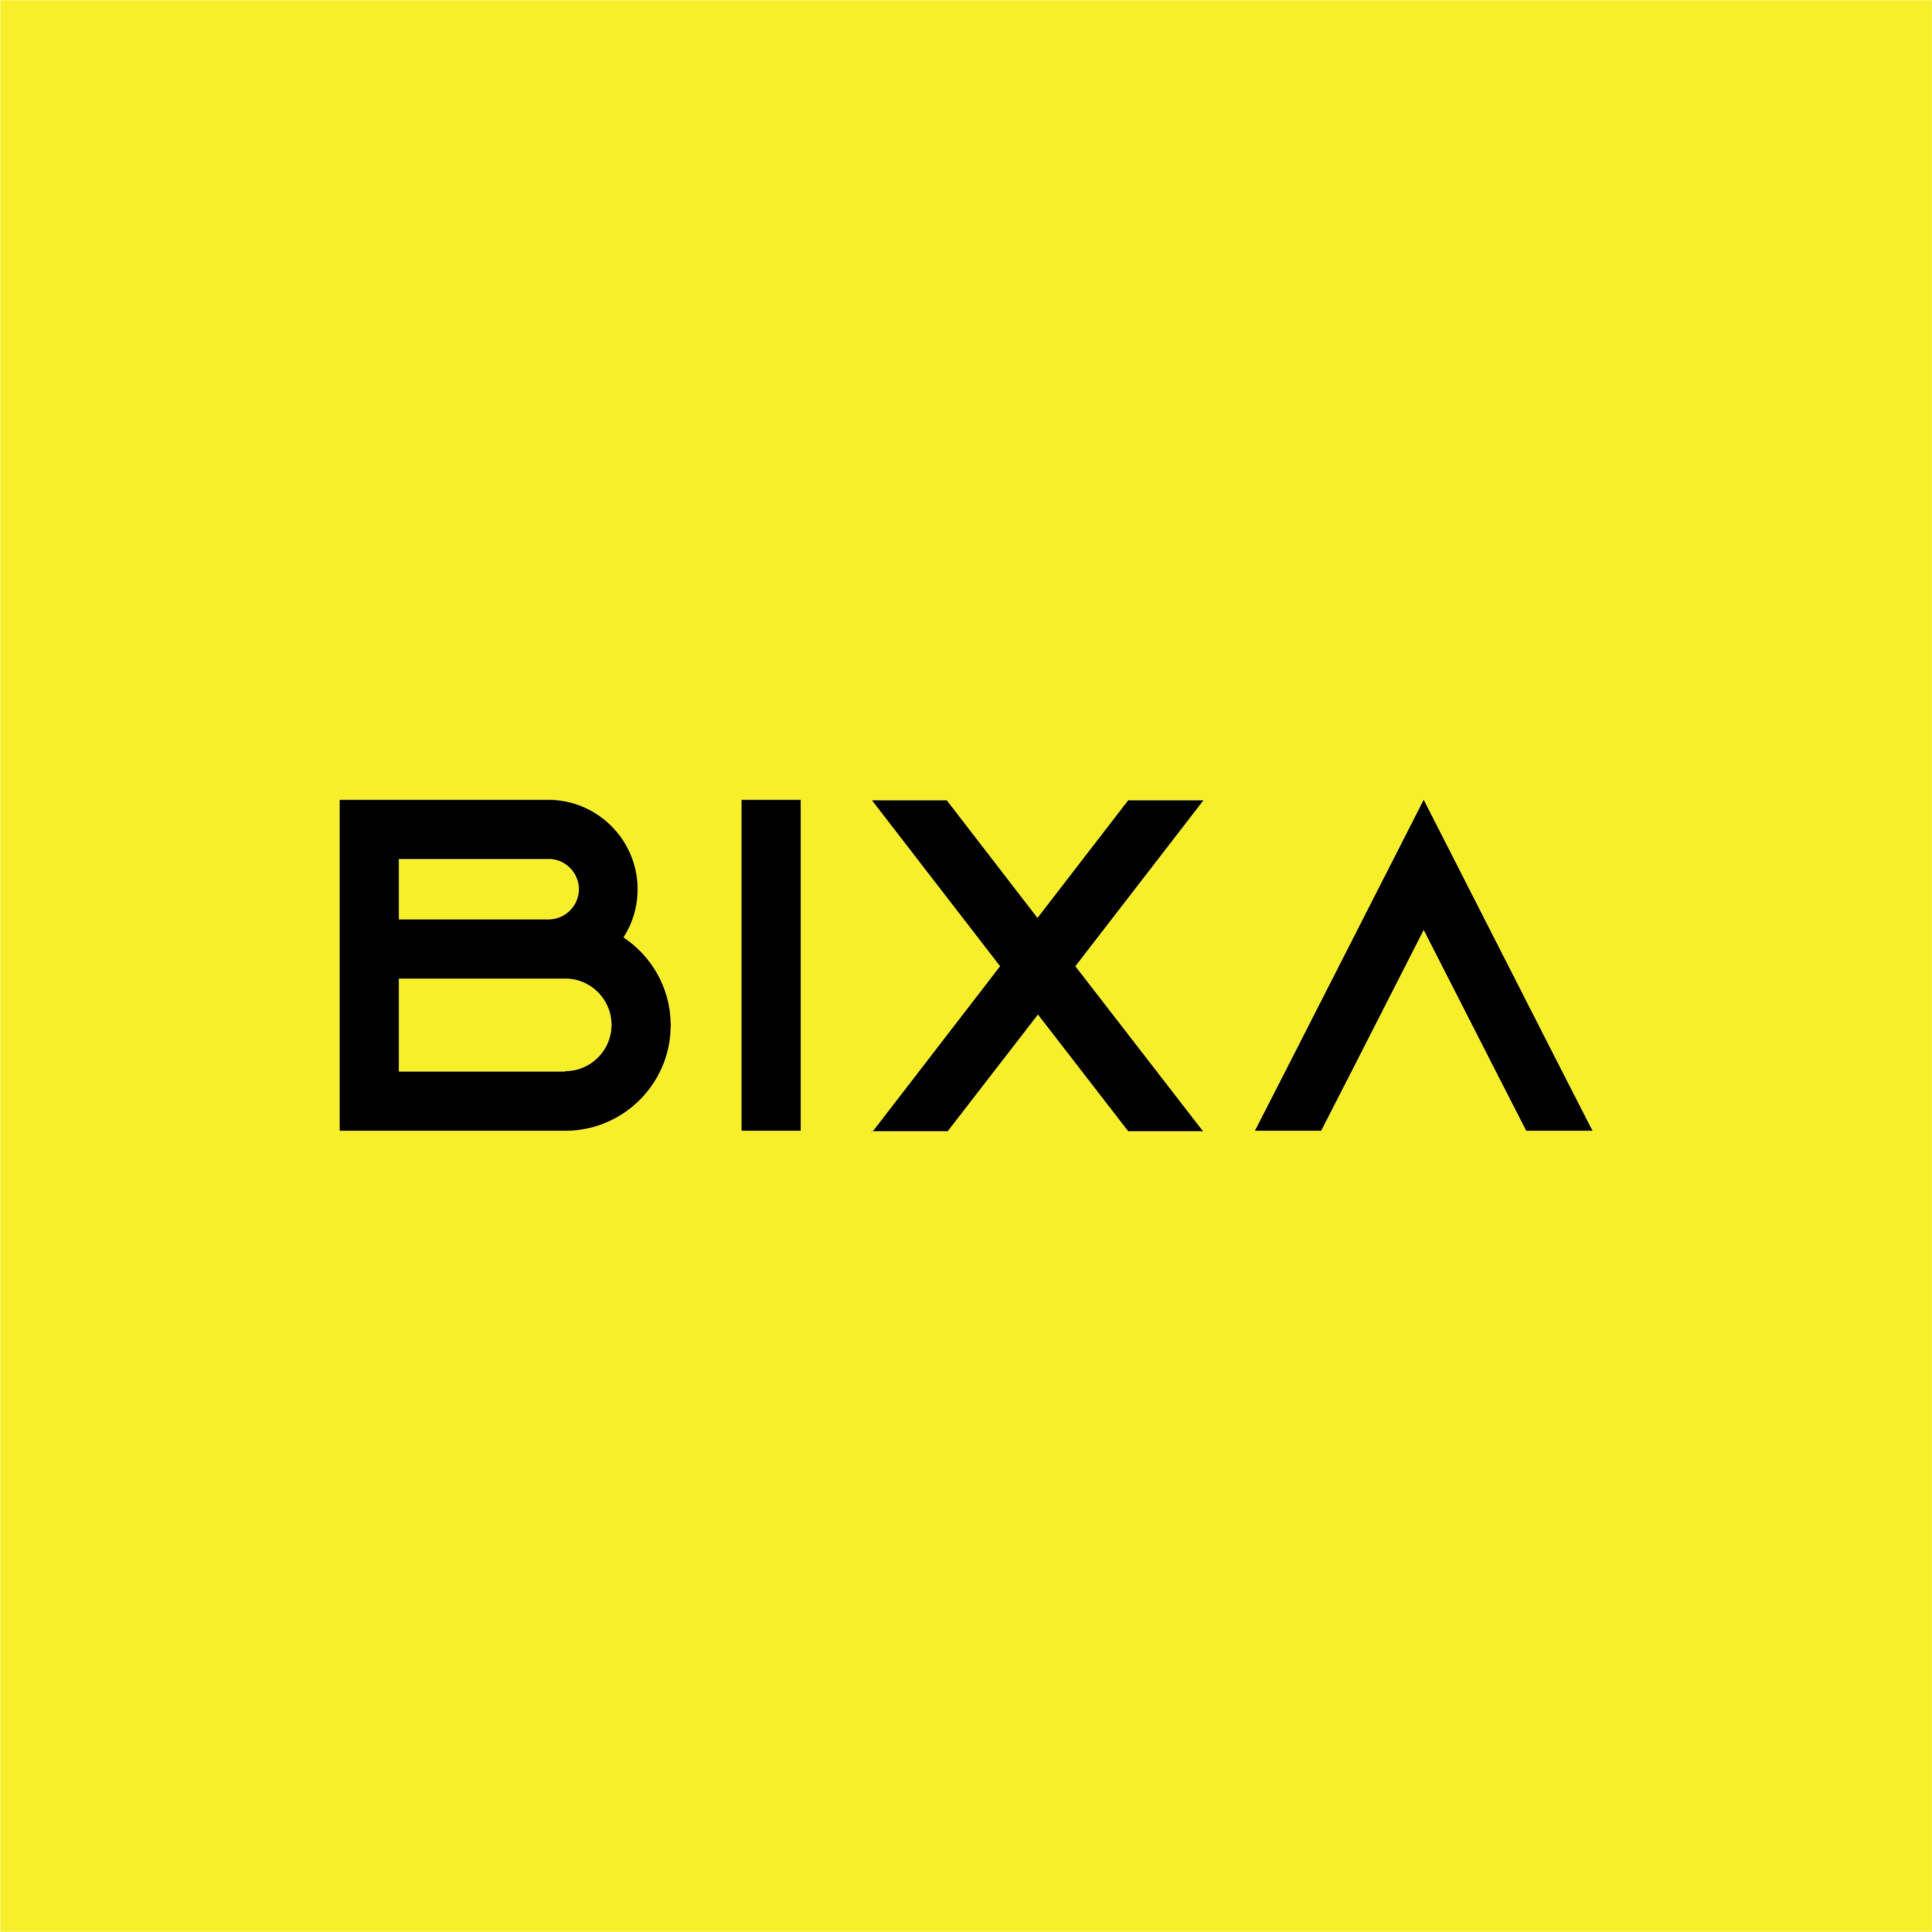 Bixa Logo